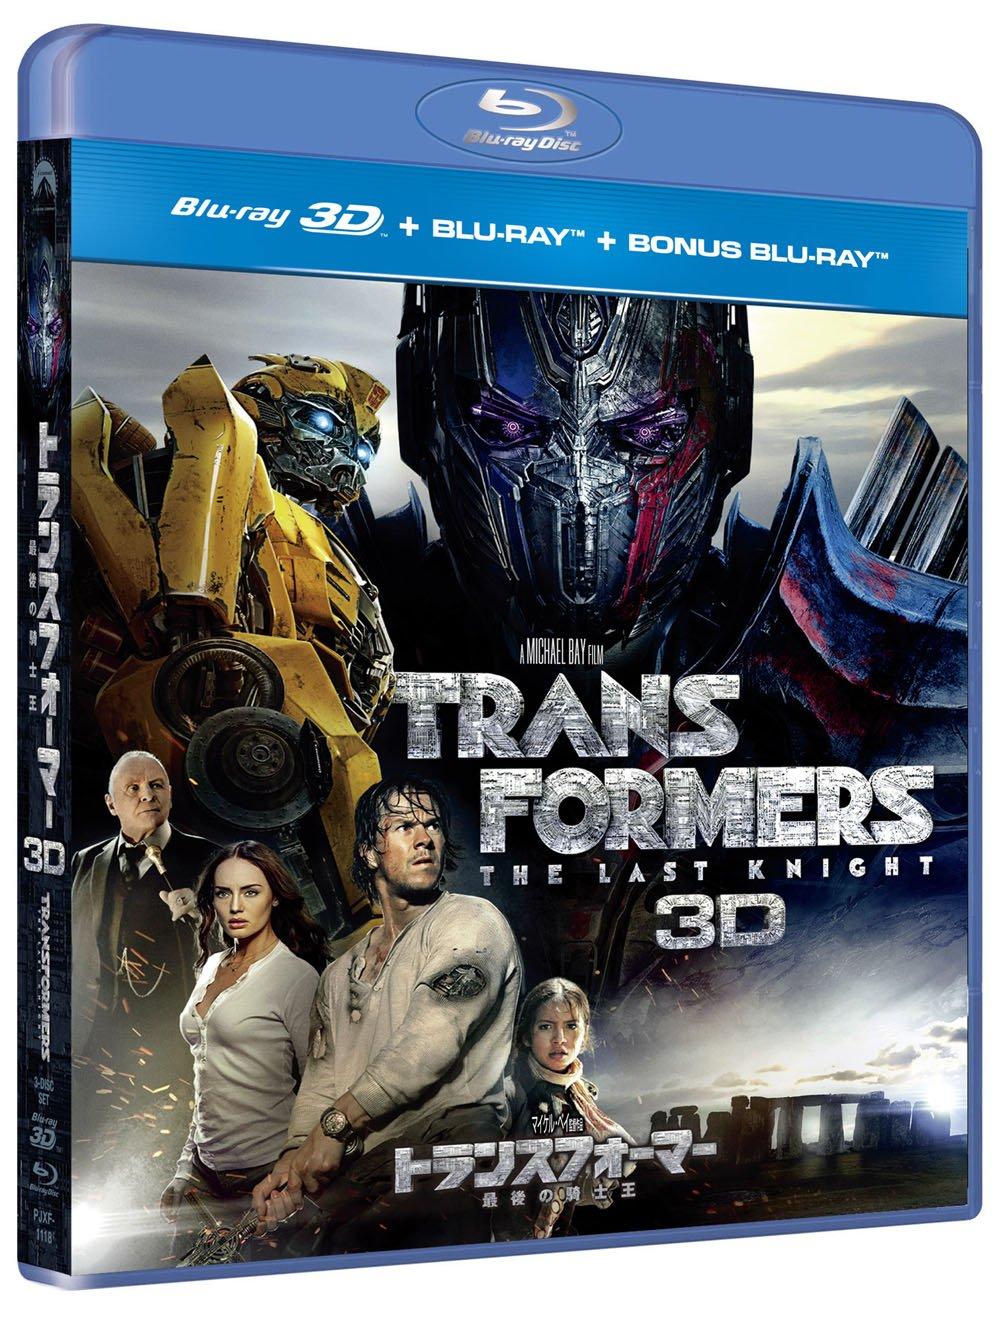 【Amazon.co.jp限定】トランスフォーマー/最後の騎士王 3D+ブルーレイ+特典ブルーレイ ※初回限定生産(キャラクターカードセット付き)